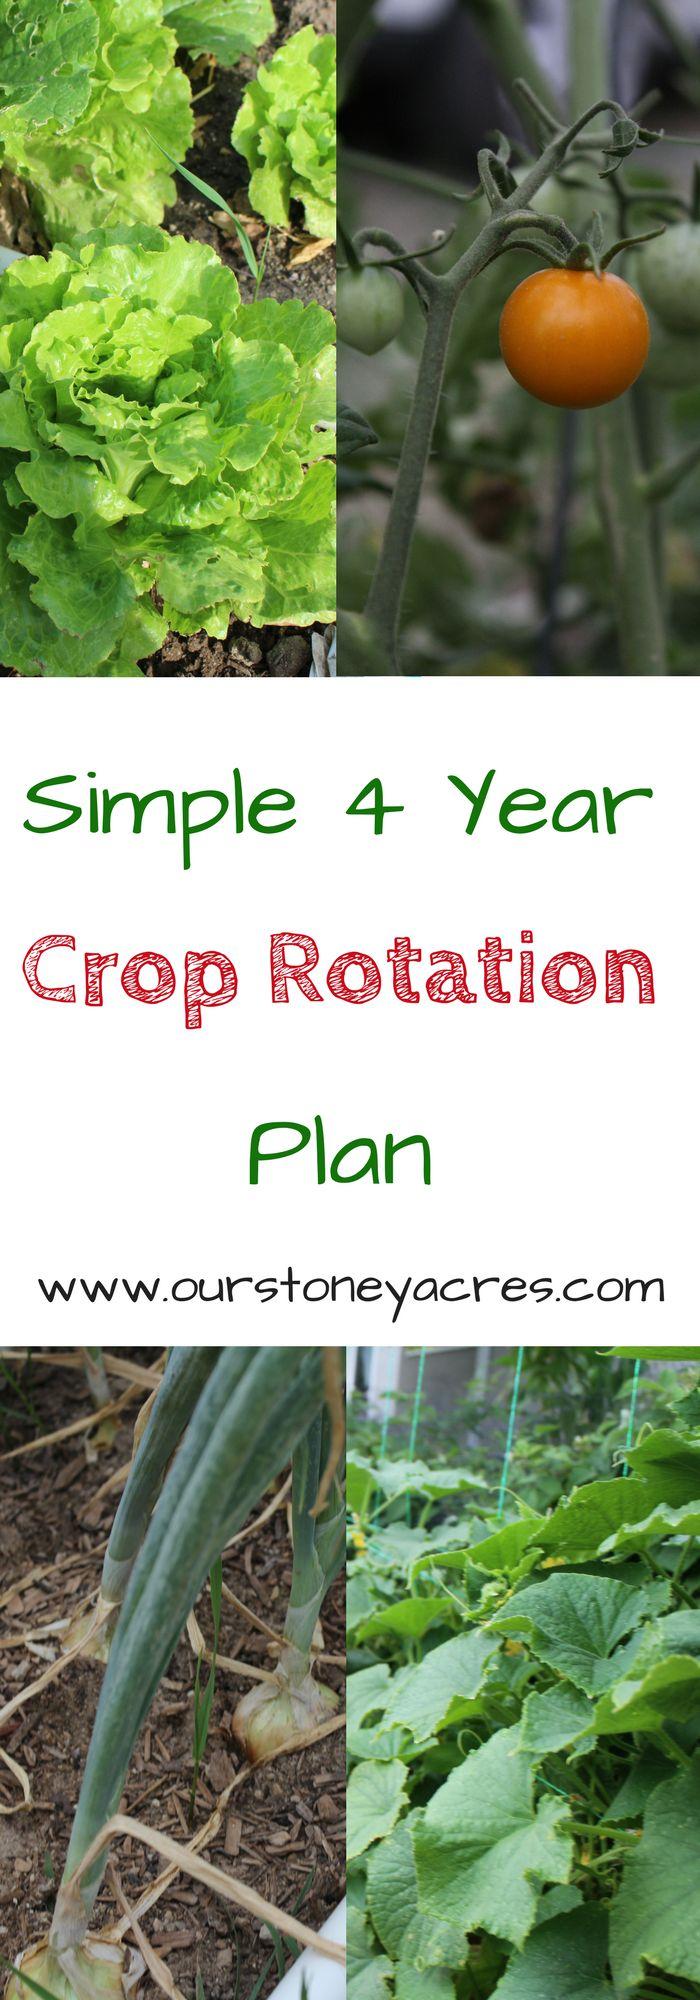 A Simple 4 Year Crop Rotation Plan Our Stoney Acres Organic Vegetable Garden Vegetable Garden Soil Garden Soil Backyard garden crop rotation